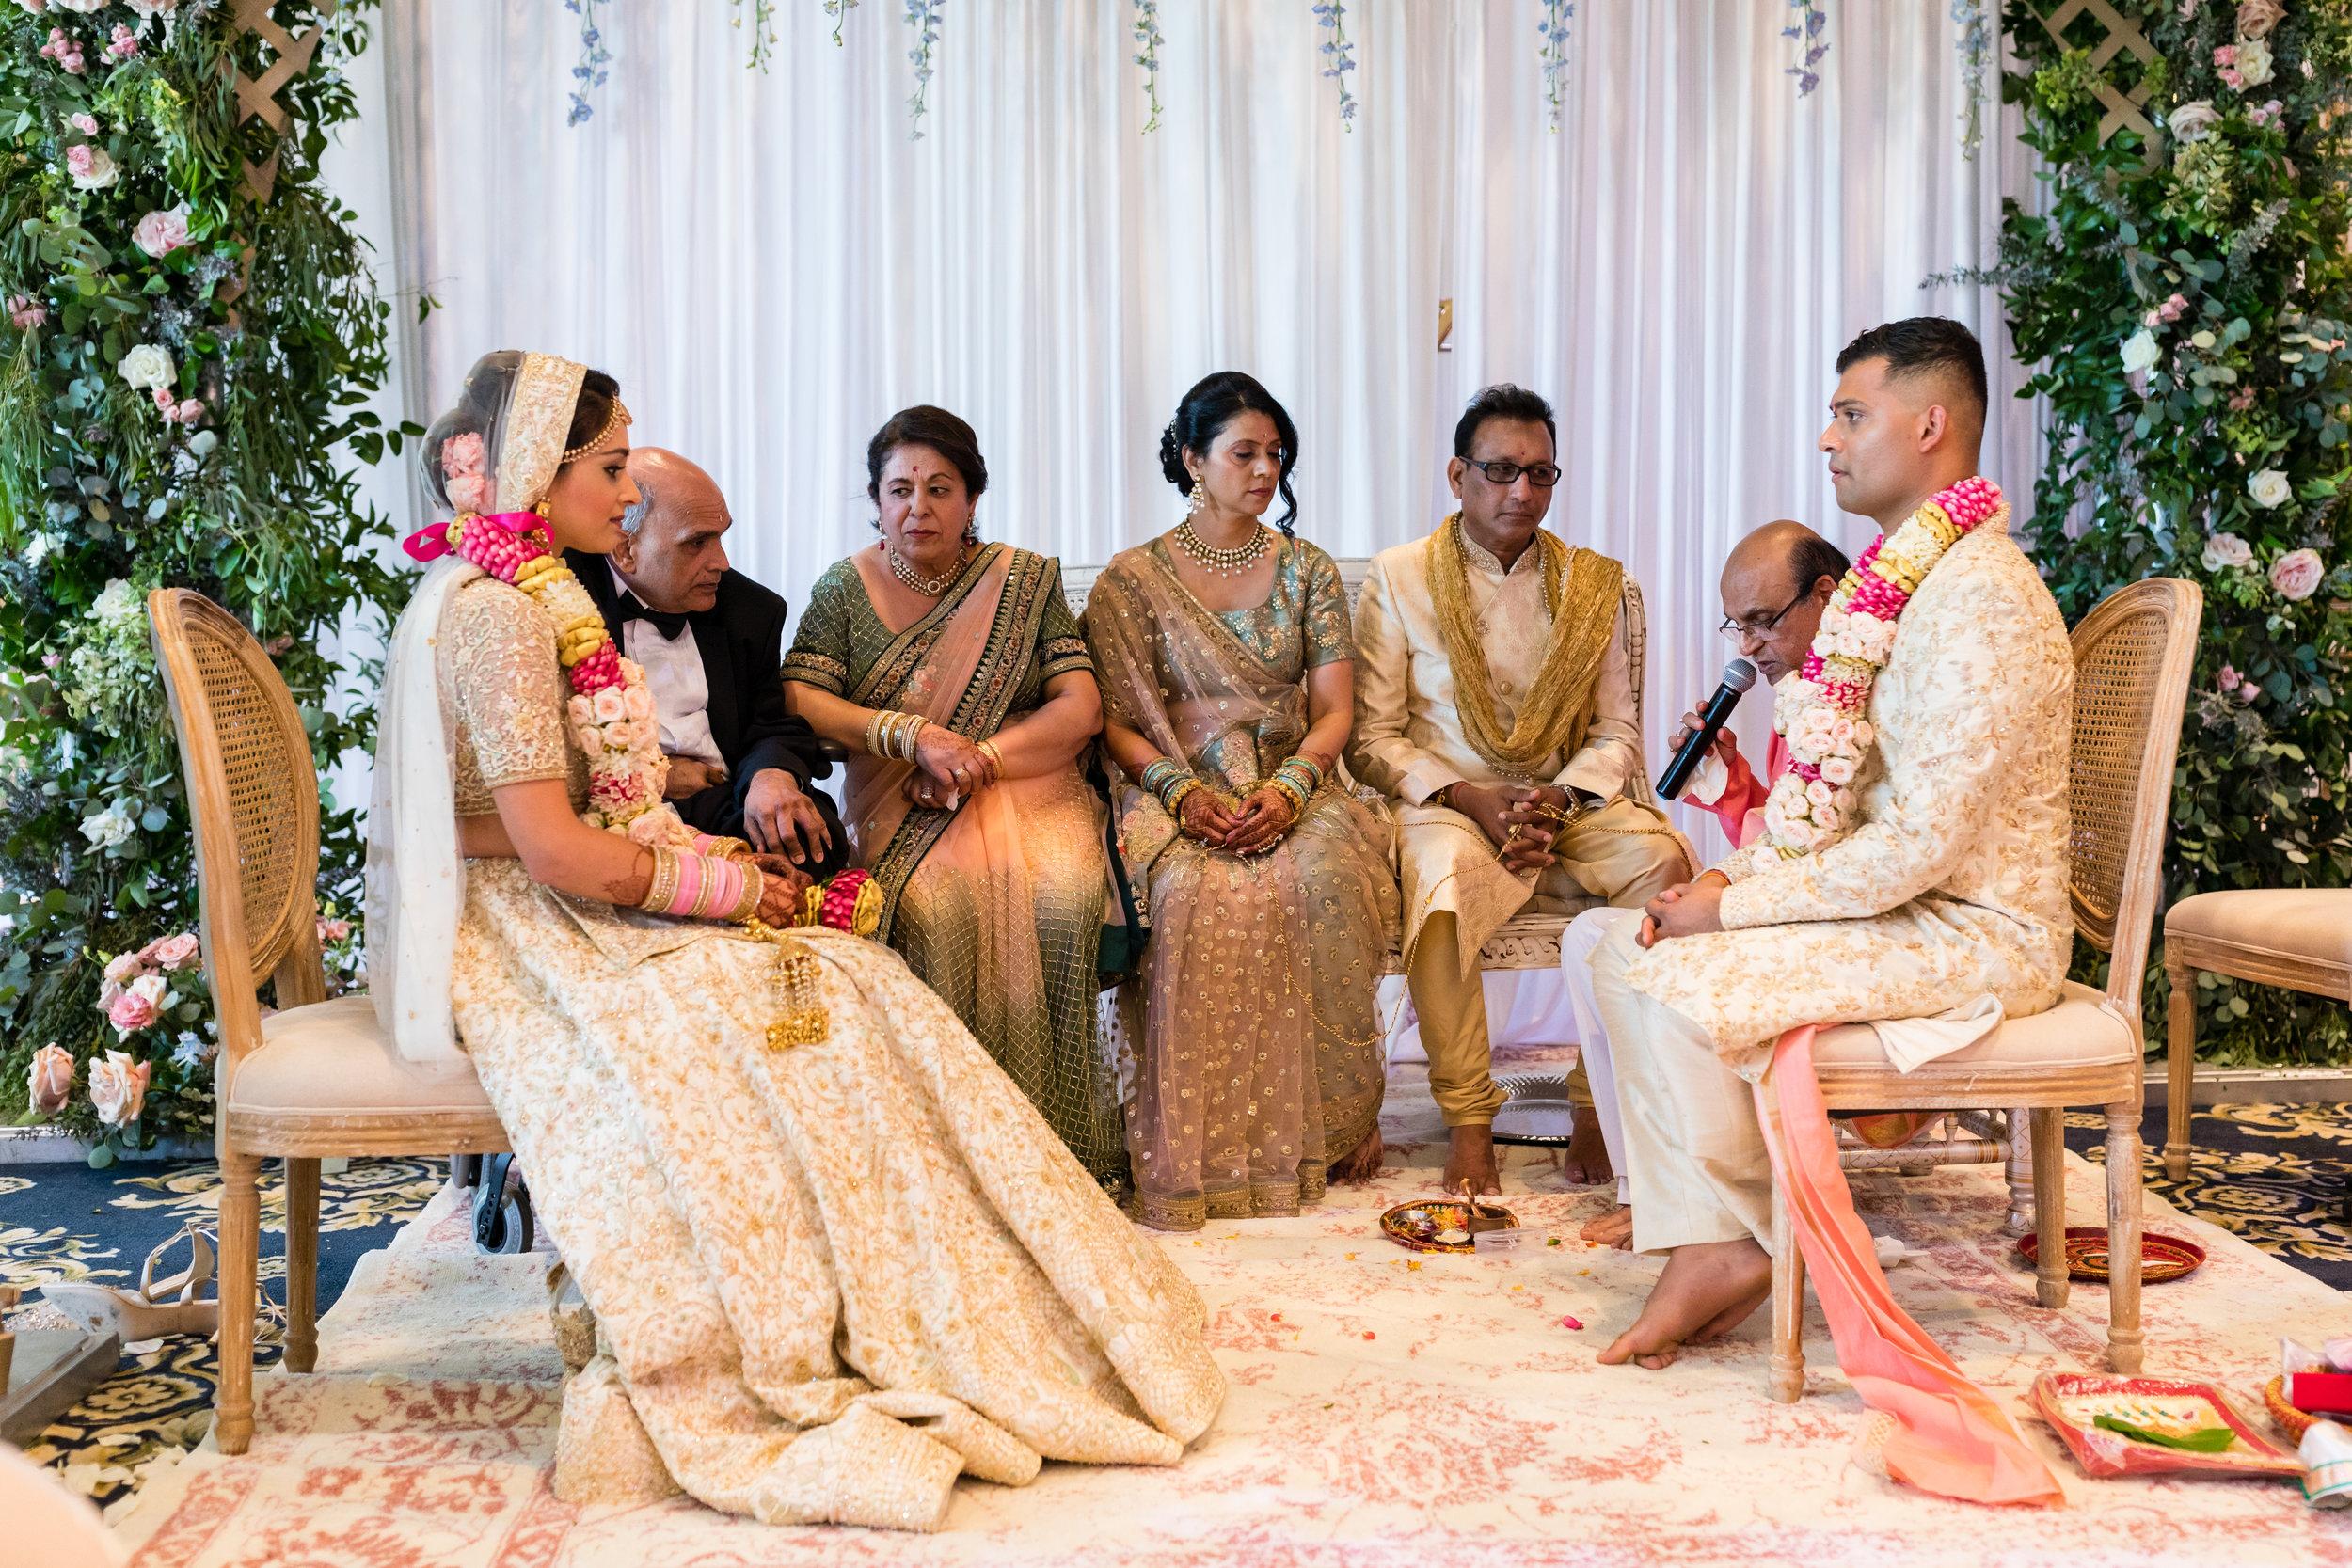 INDIAN WEDDING BRIDE AND GROOM IN ALTER.jpg